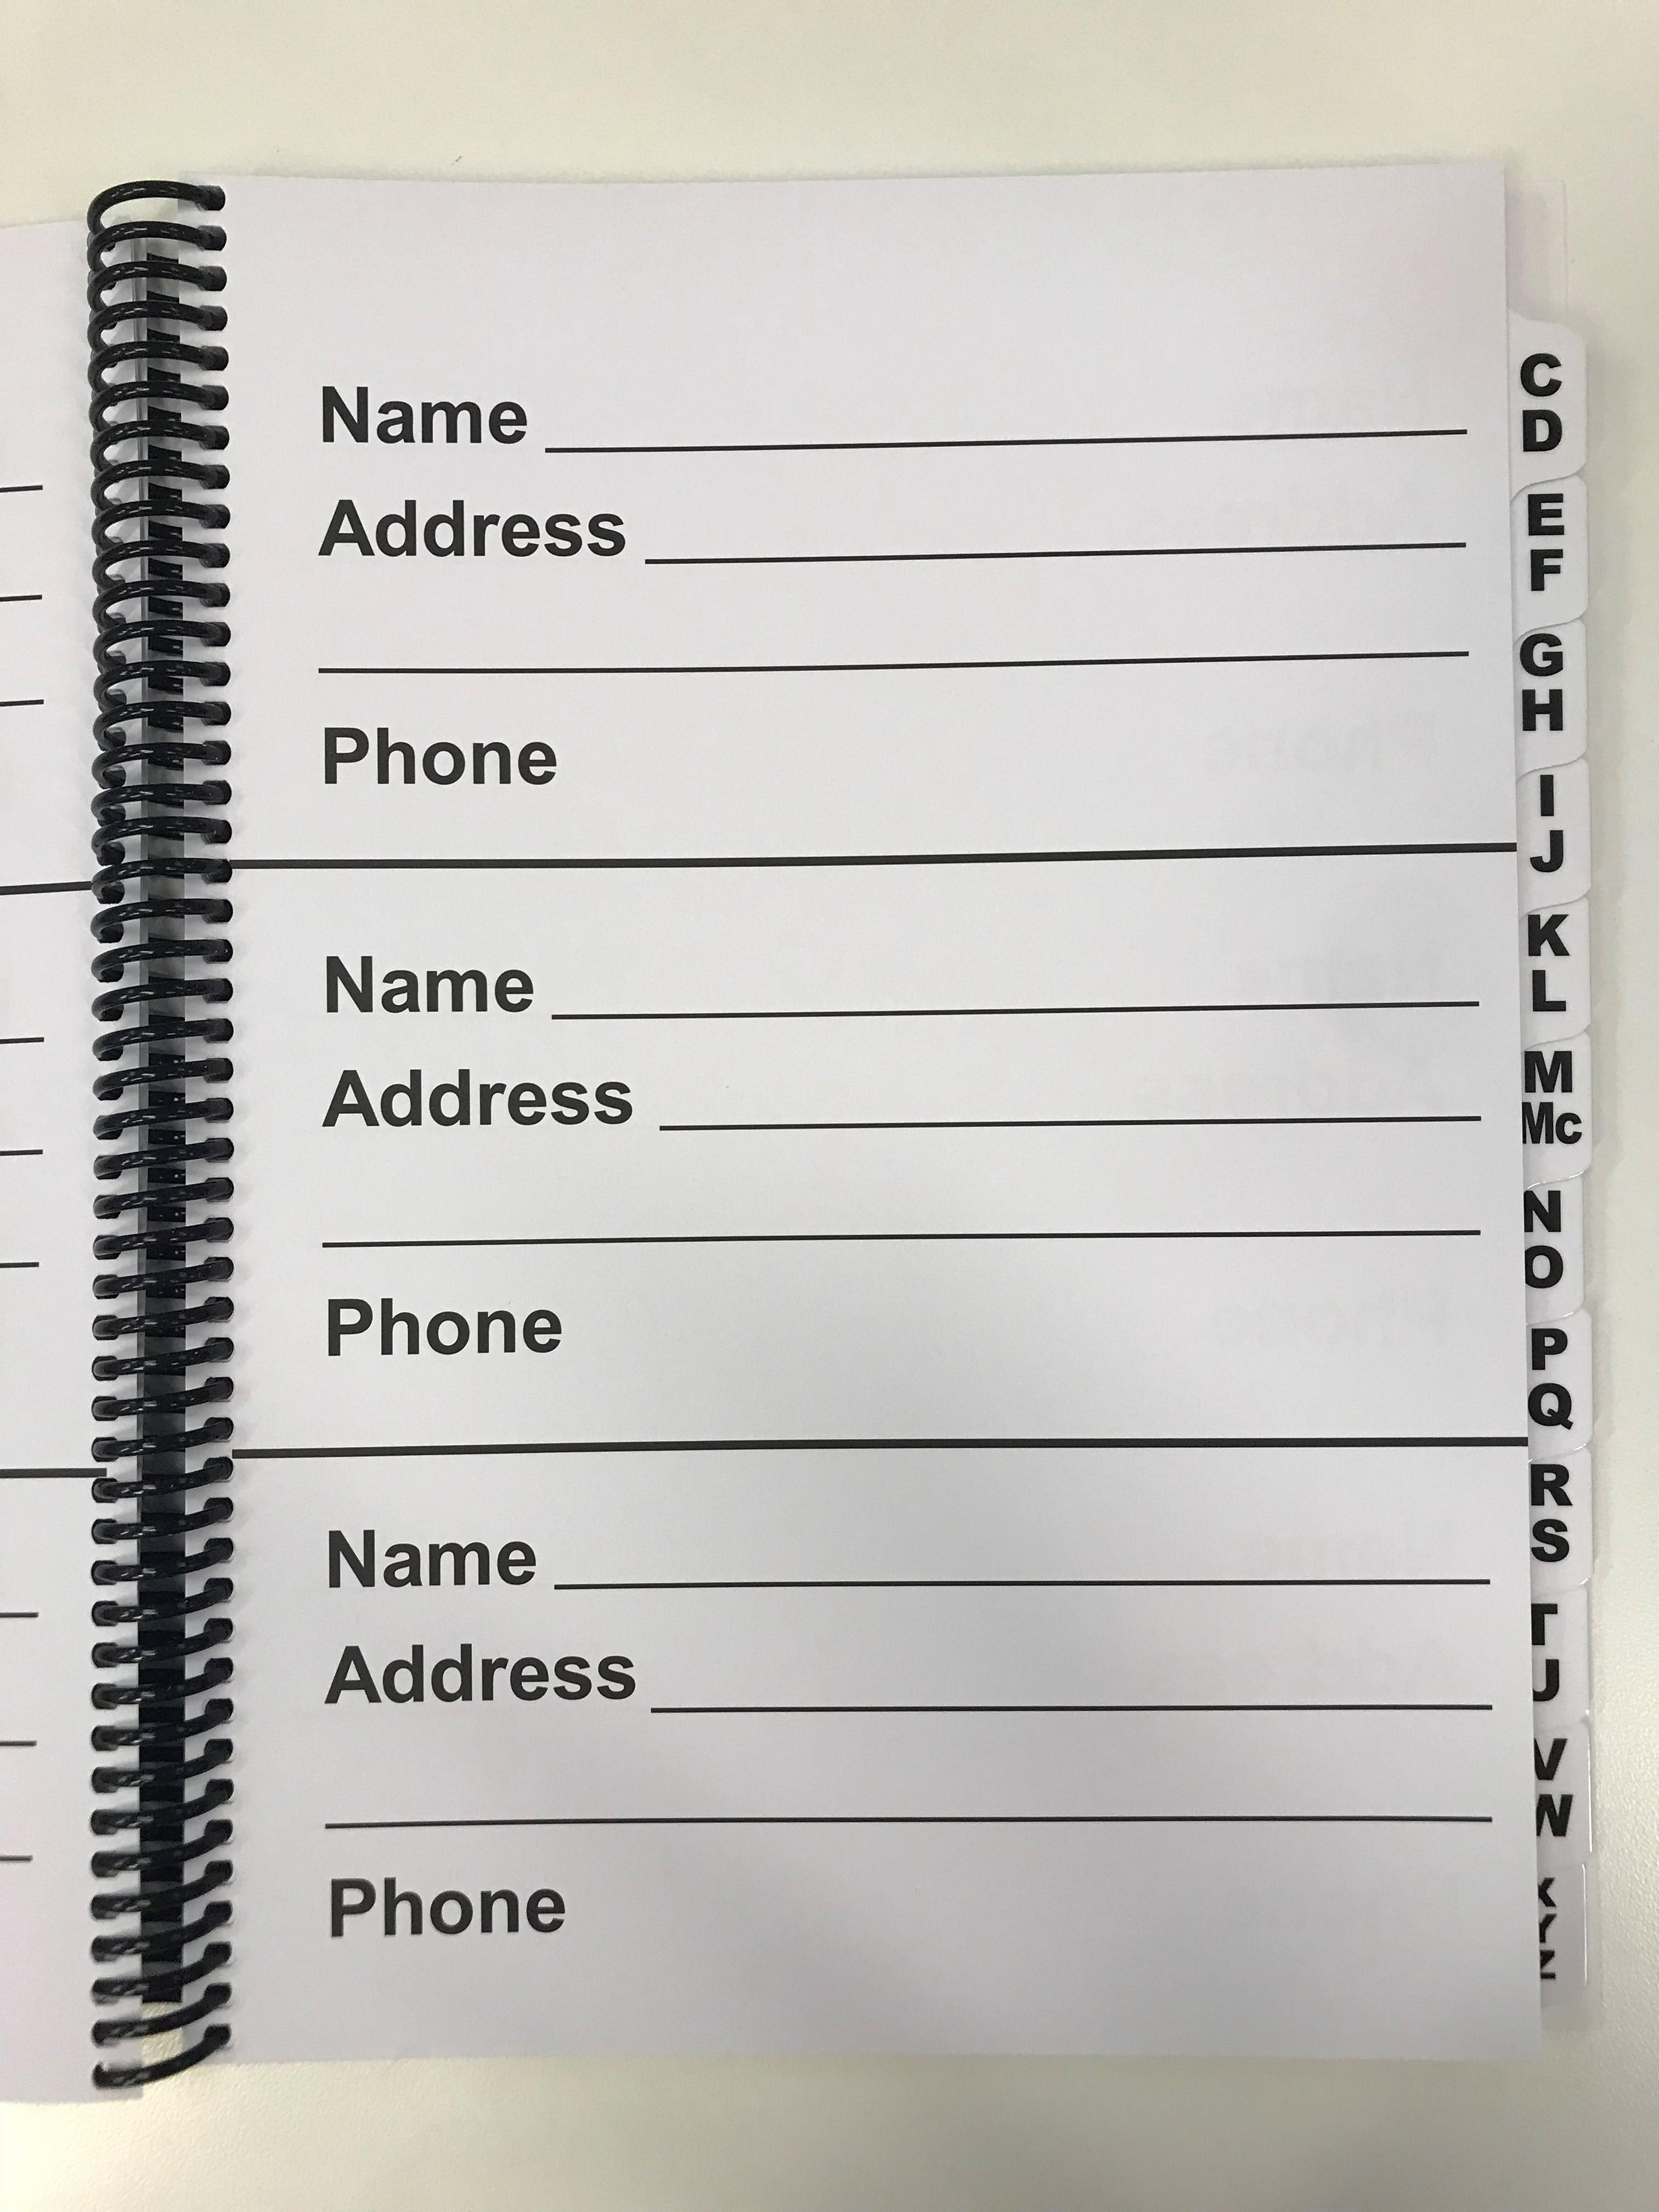 blind foundation large print address book